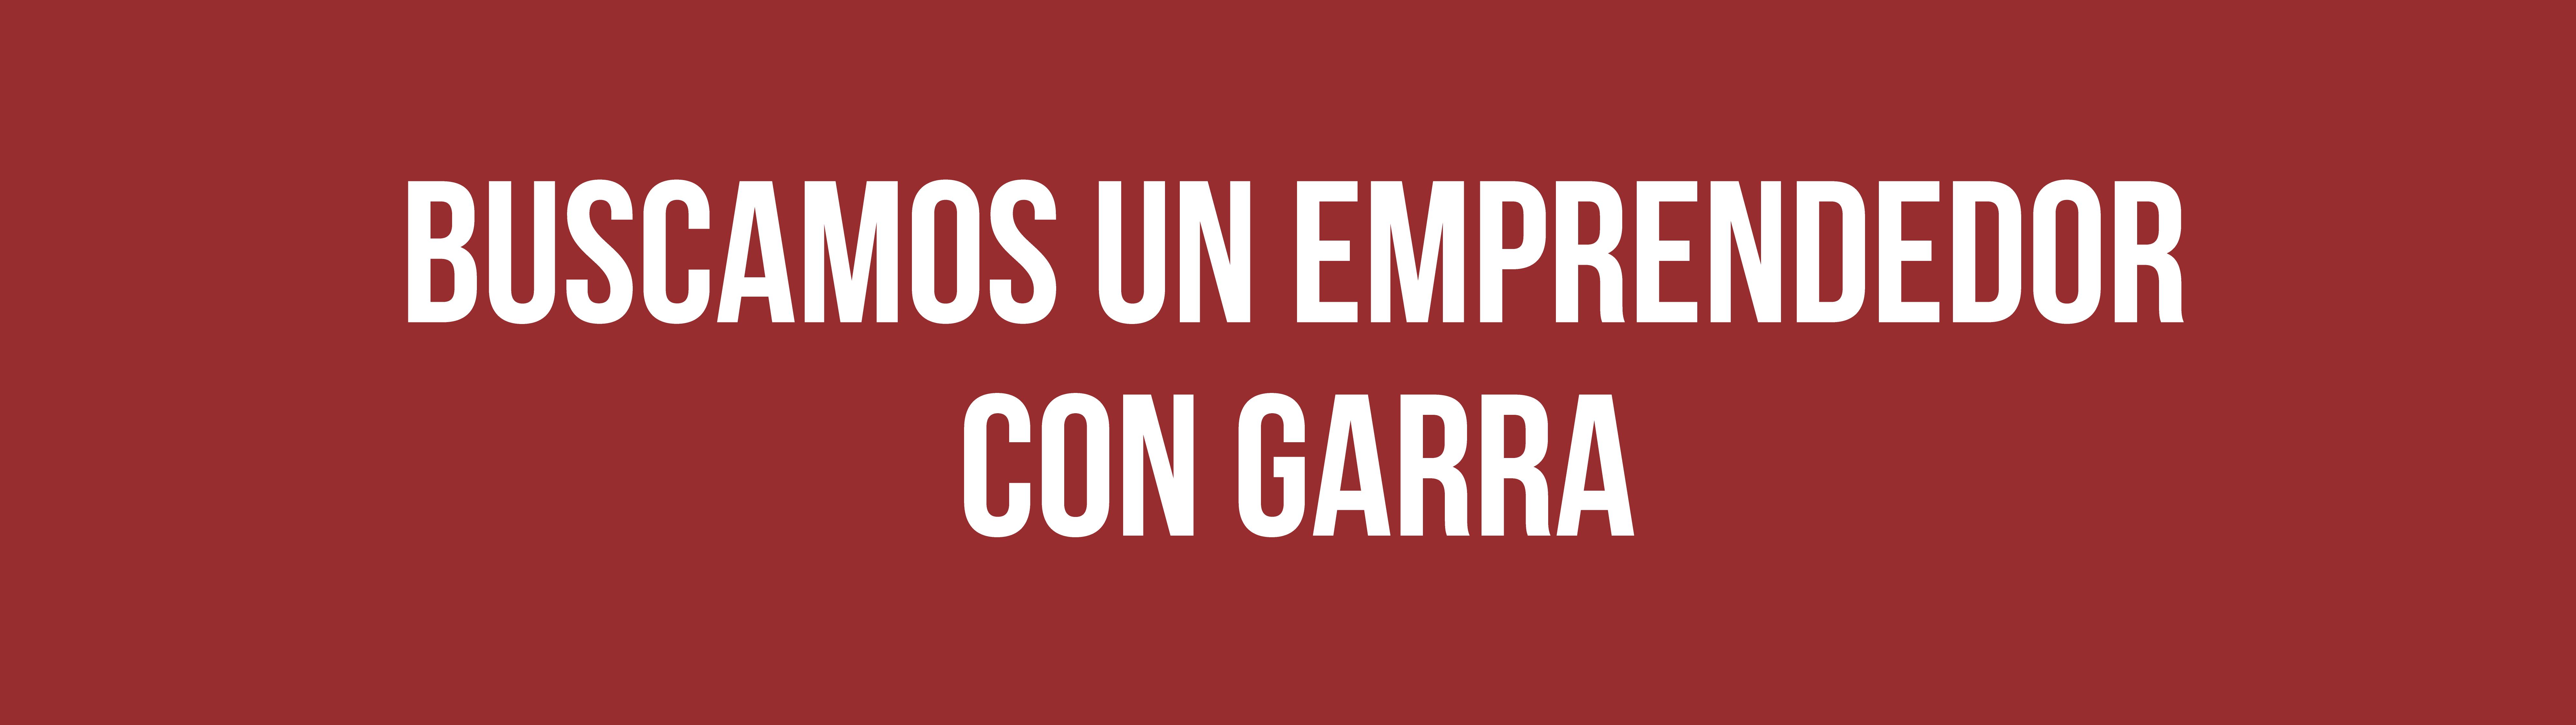 garra_spanish-04-04